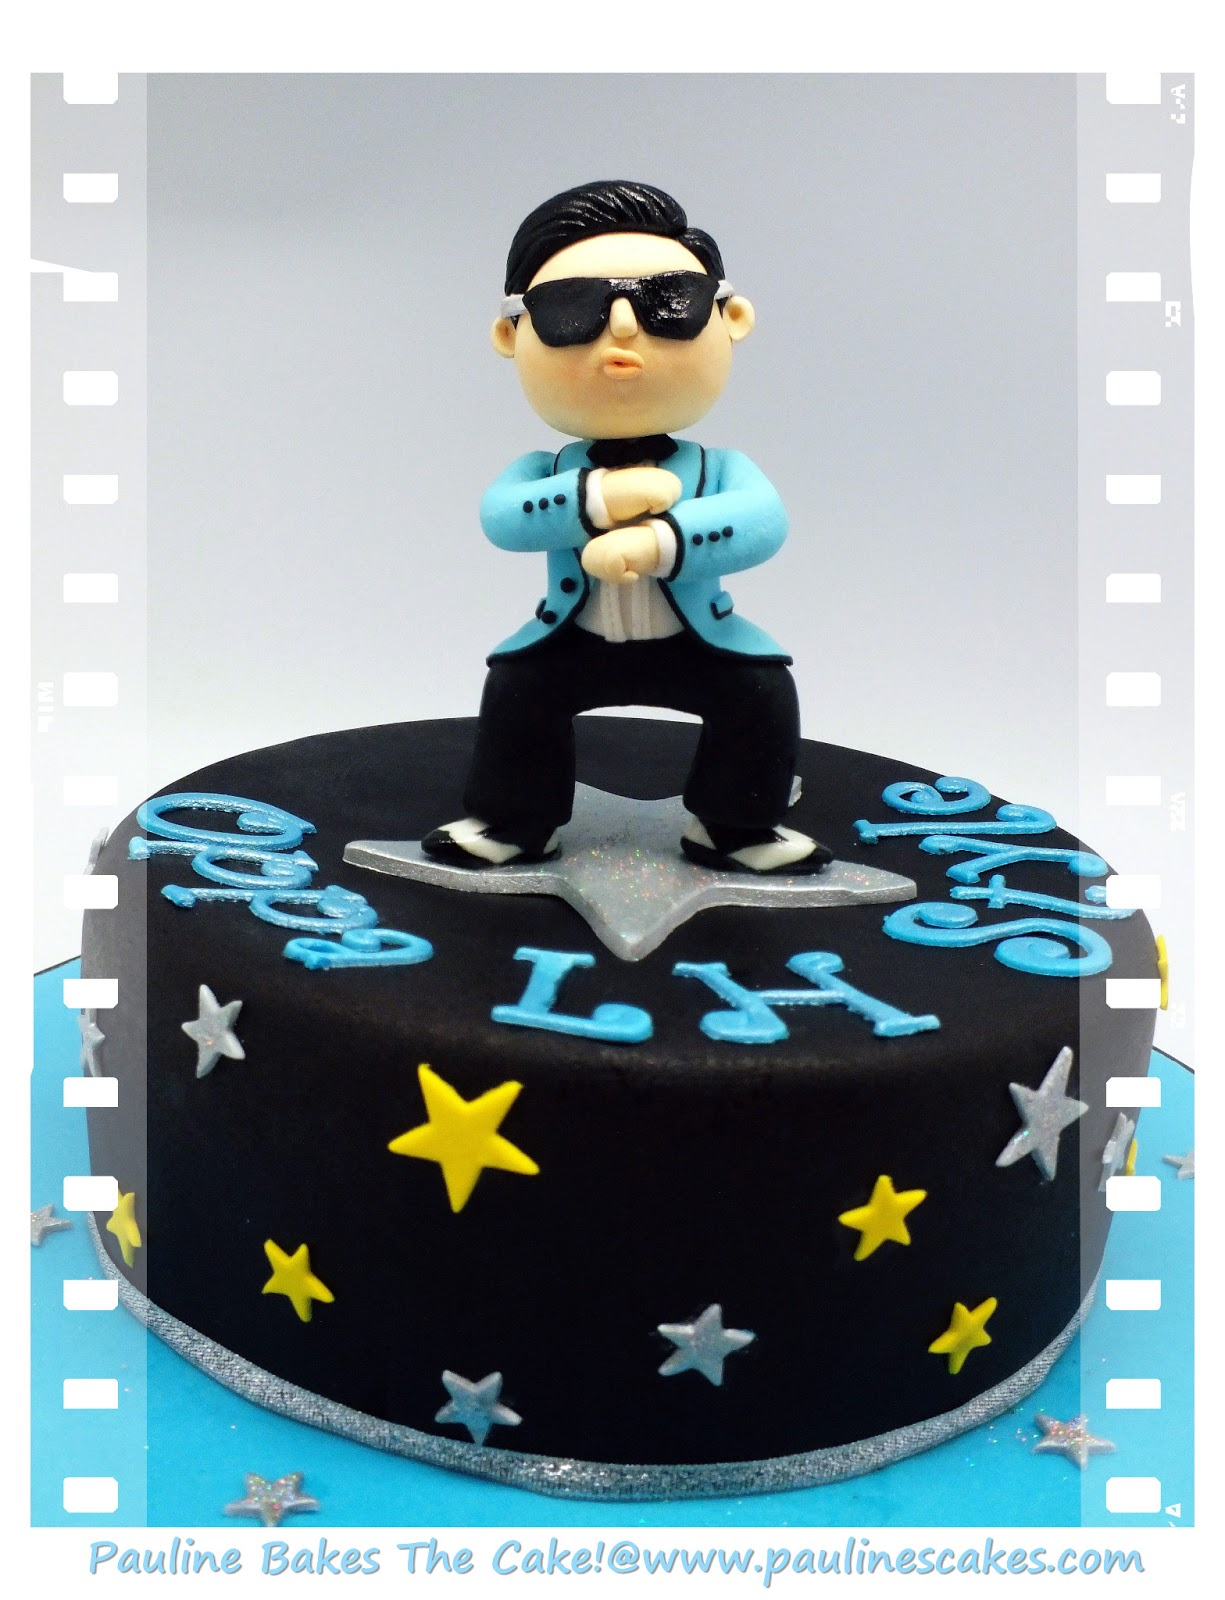 Kpop Cakes fxband infinite shinee superjunior exo bap Asianfanfics